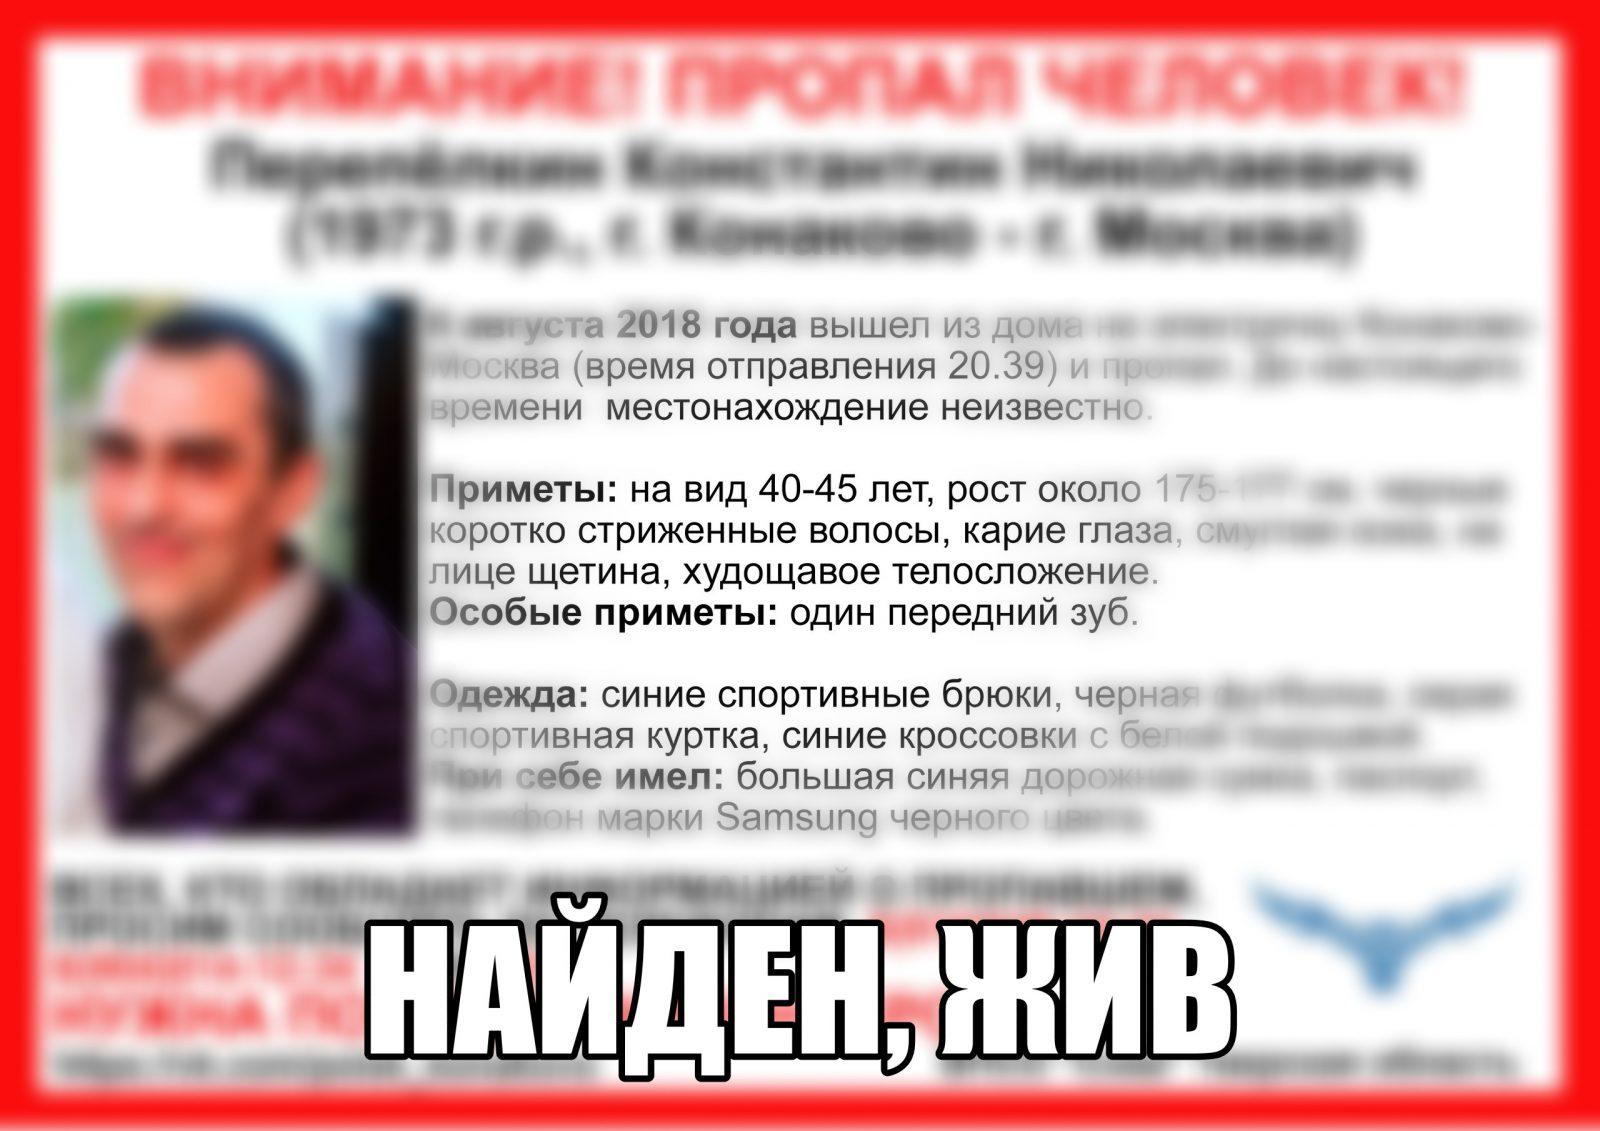 [Жив] Пропал Перепёлкин Константин Николаевич (1973 г.р.)